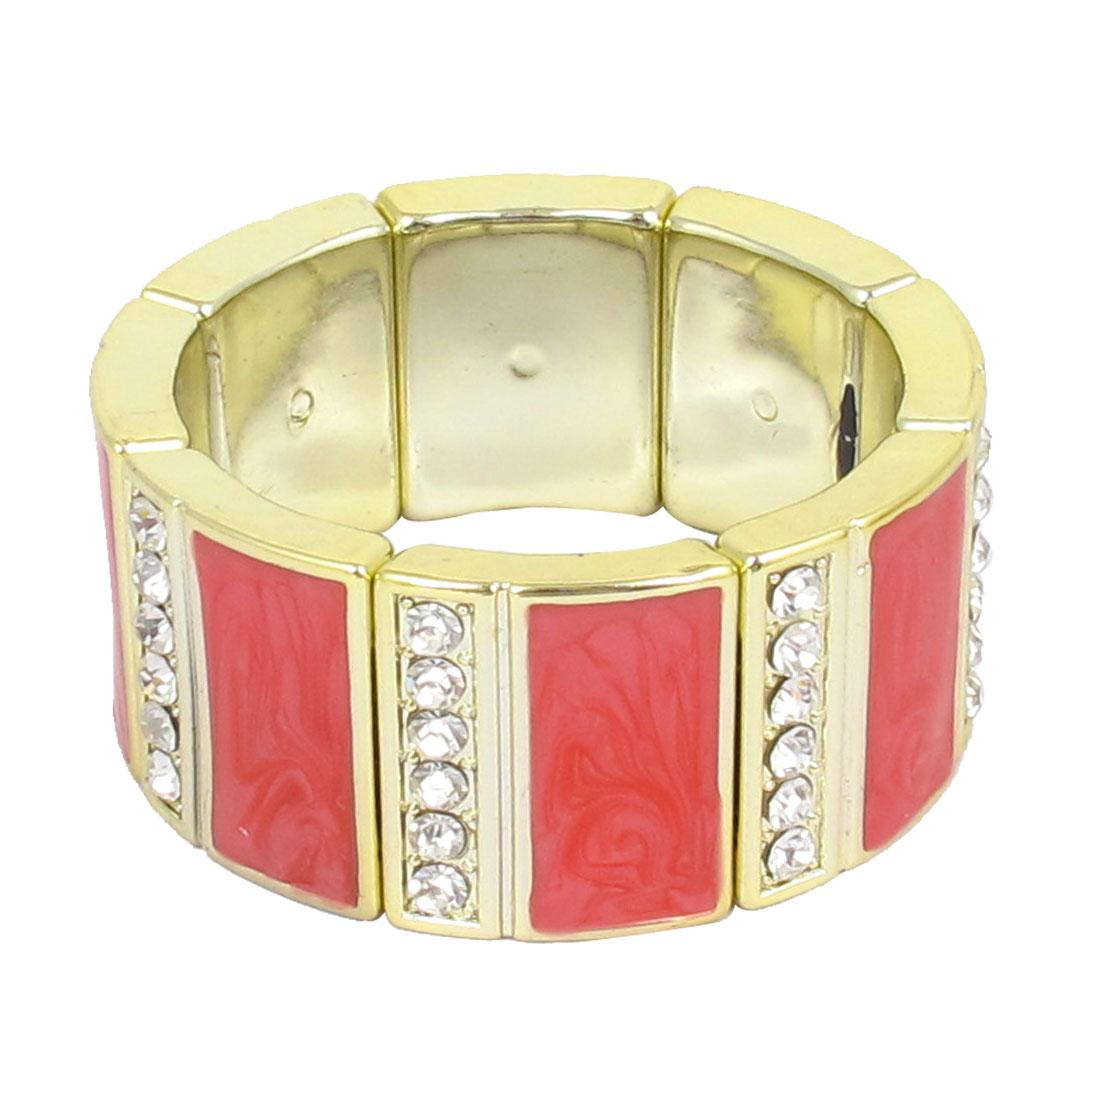 Women Plastic Rhinestone Detailing Stretchy Wrist Decor Bangle Bracelet Red